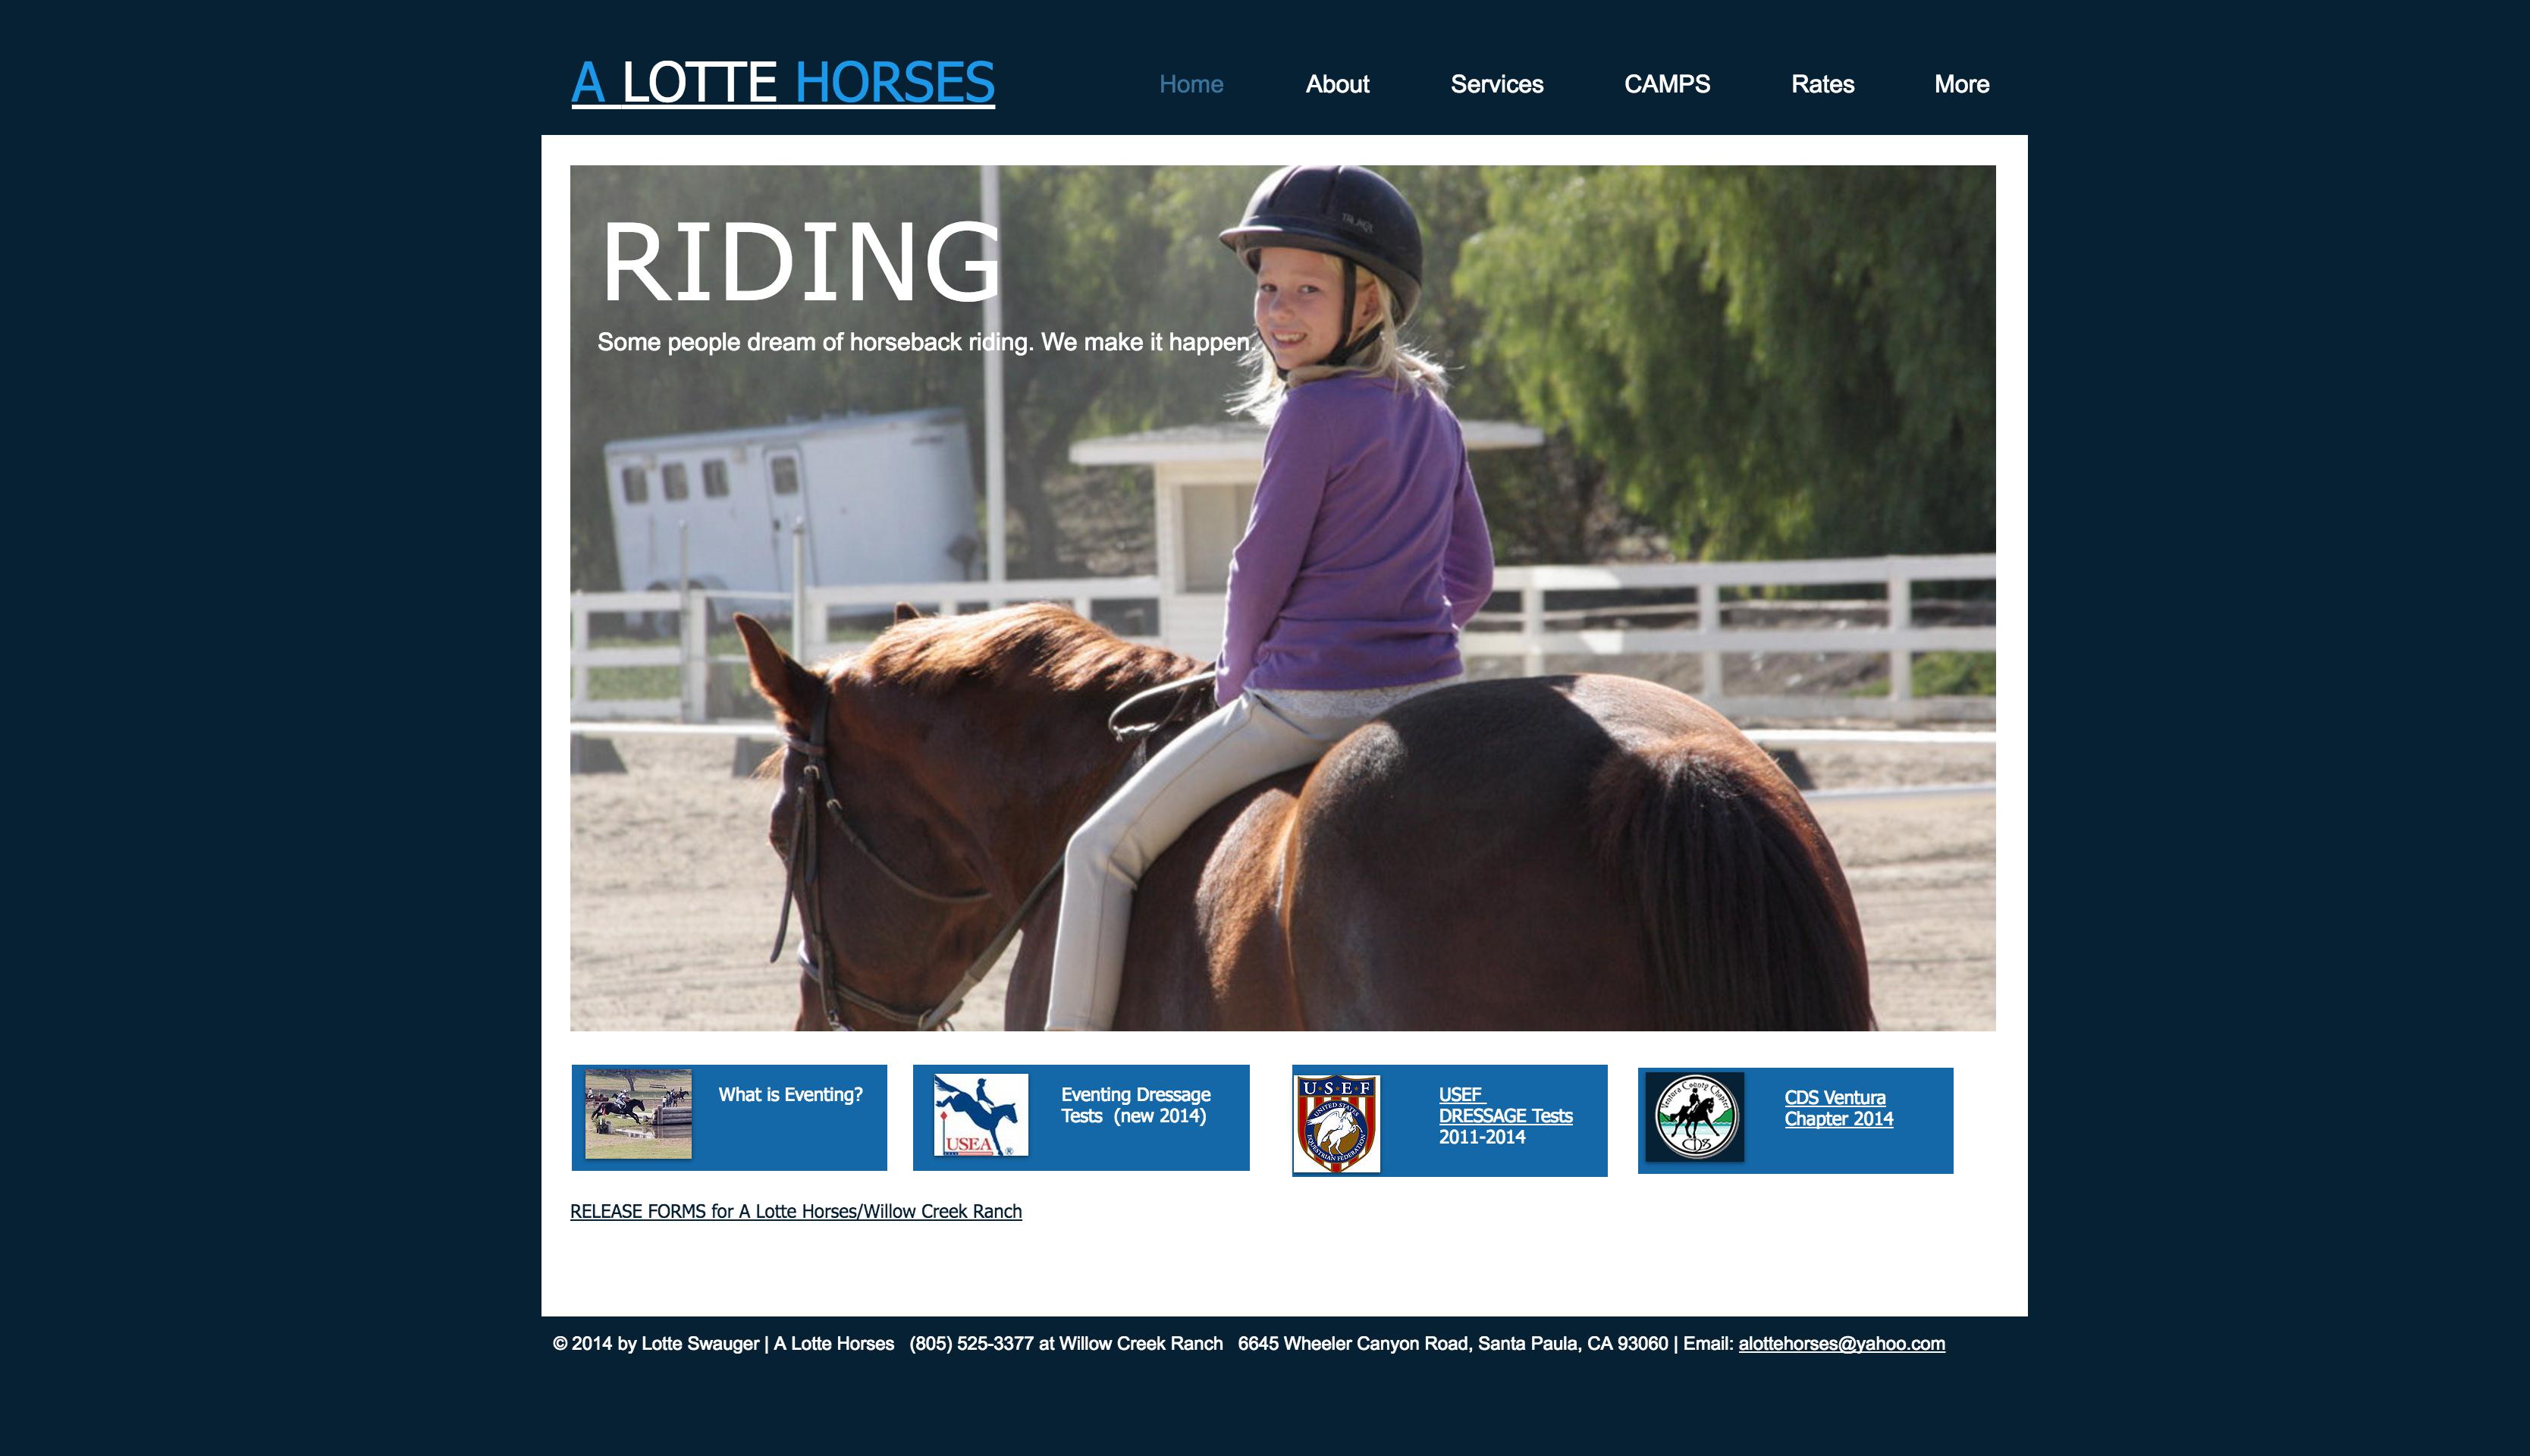 A Lotte Horses